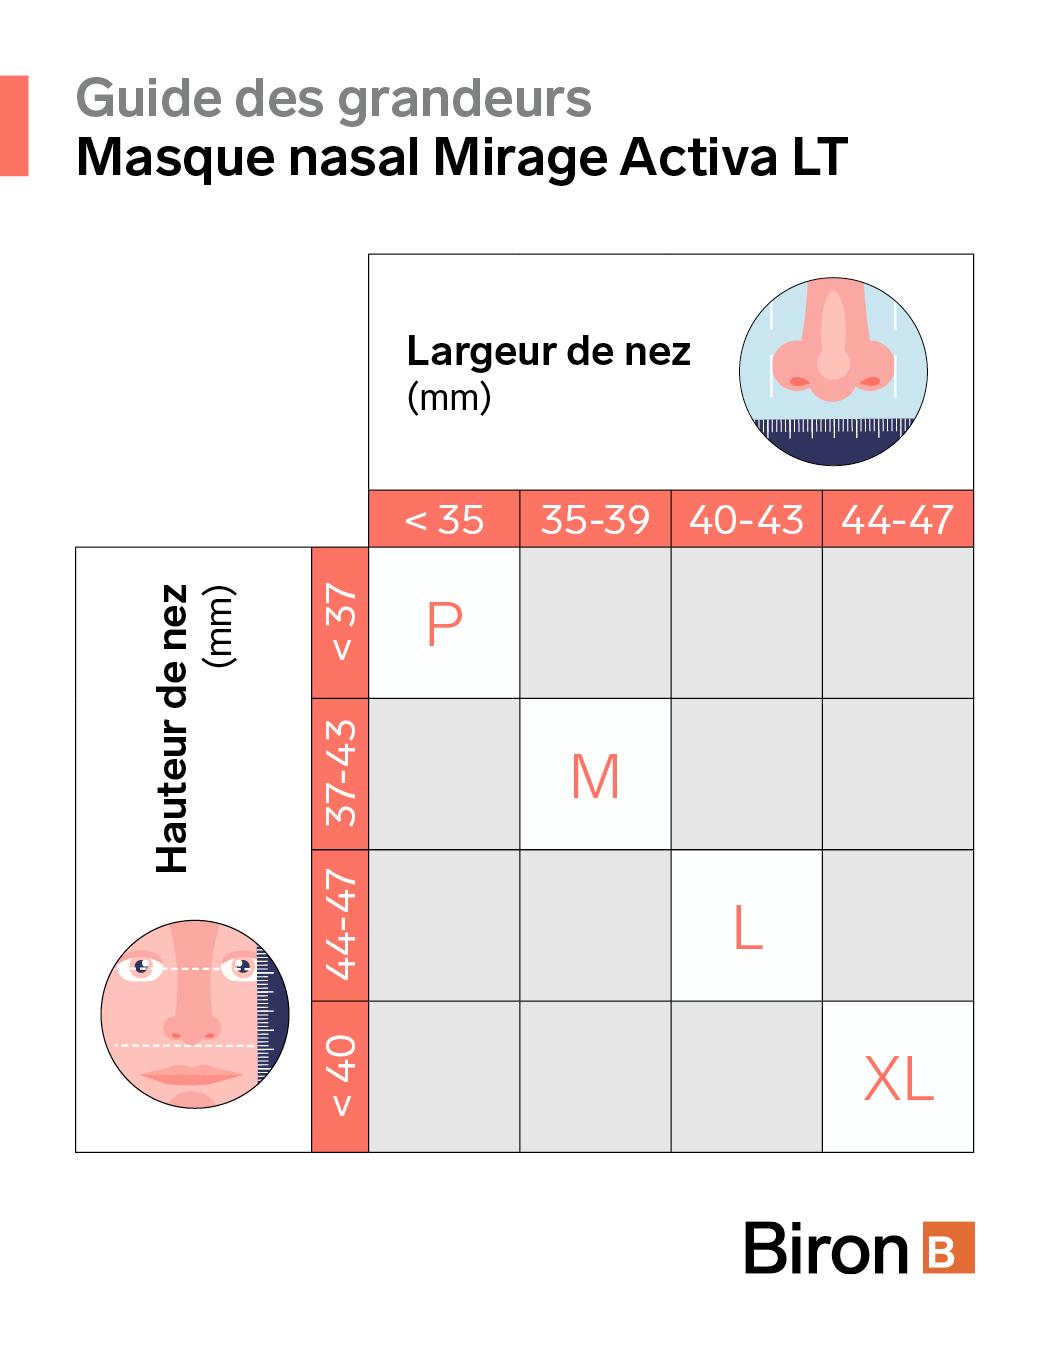 Gabarit grandeur Masque nasal Mirage Activa LT